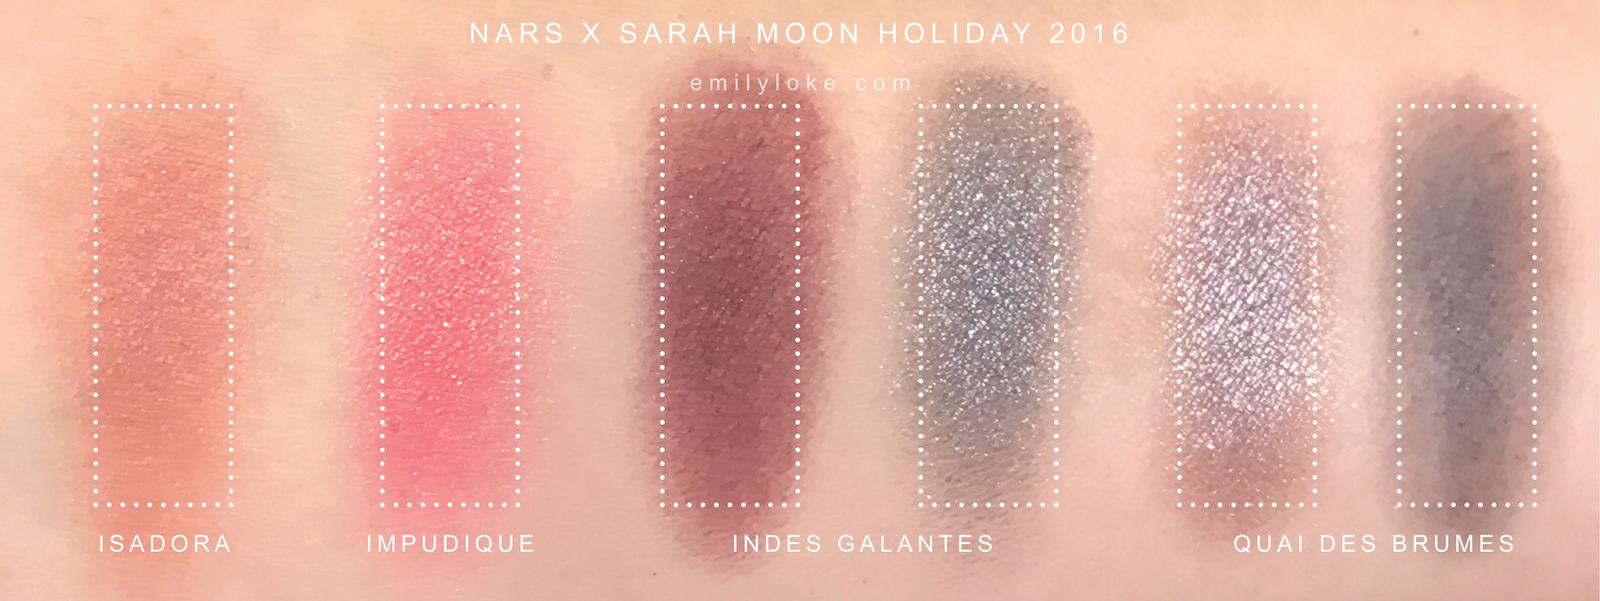 NARS x Sarah Moon Swatches 1